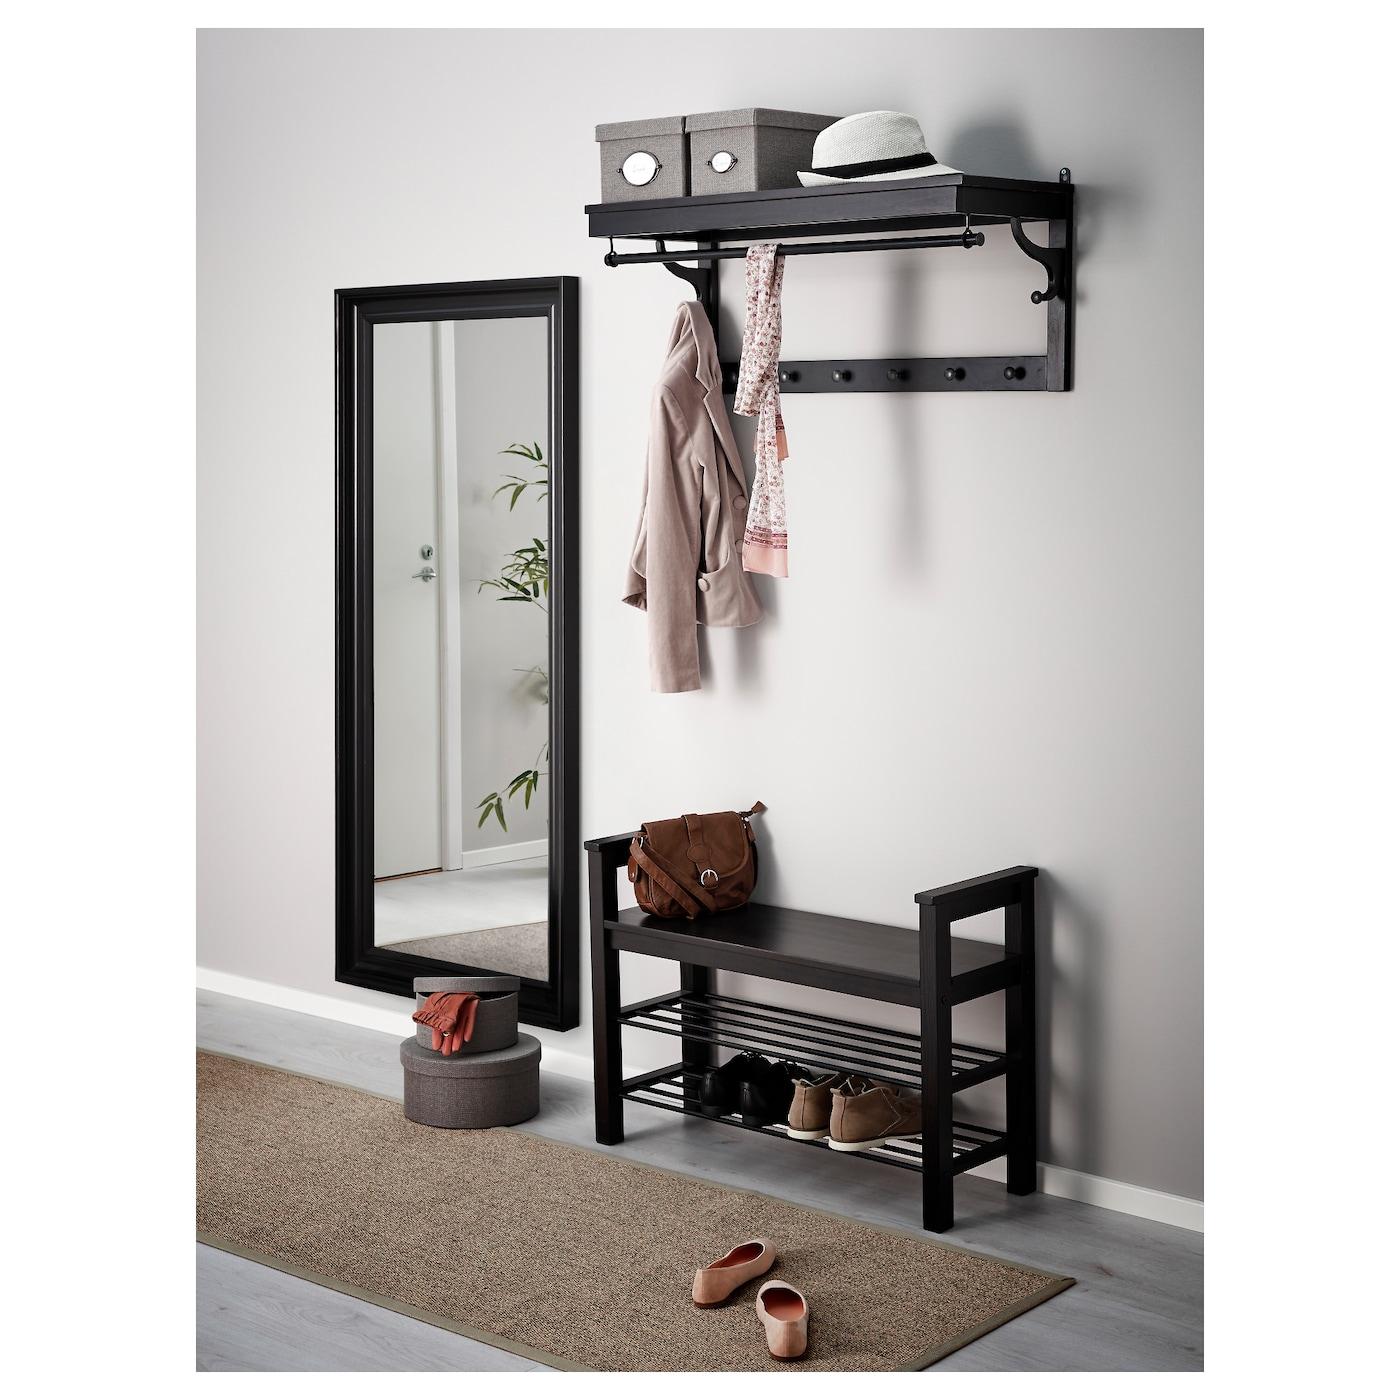 hemnes bench with shoe storage black brown 85 x 32 cm ikea. Black Bedroom Furniture Sets. Home Design Ideas